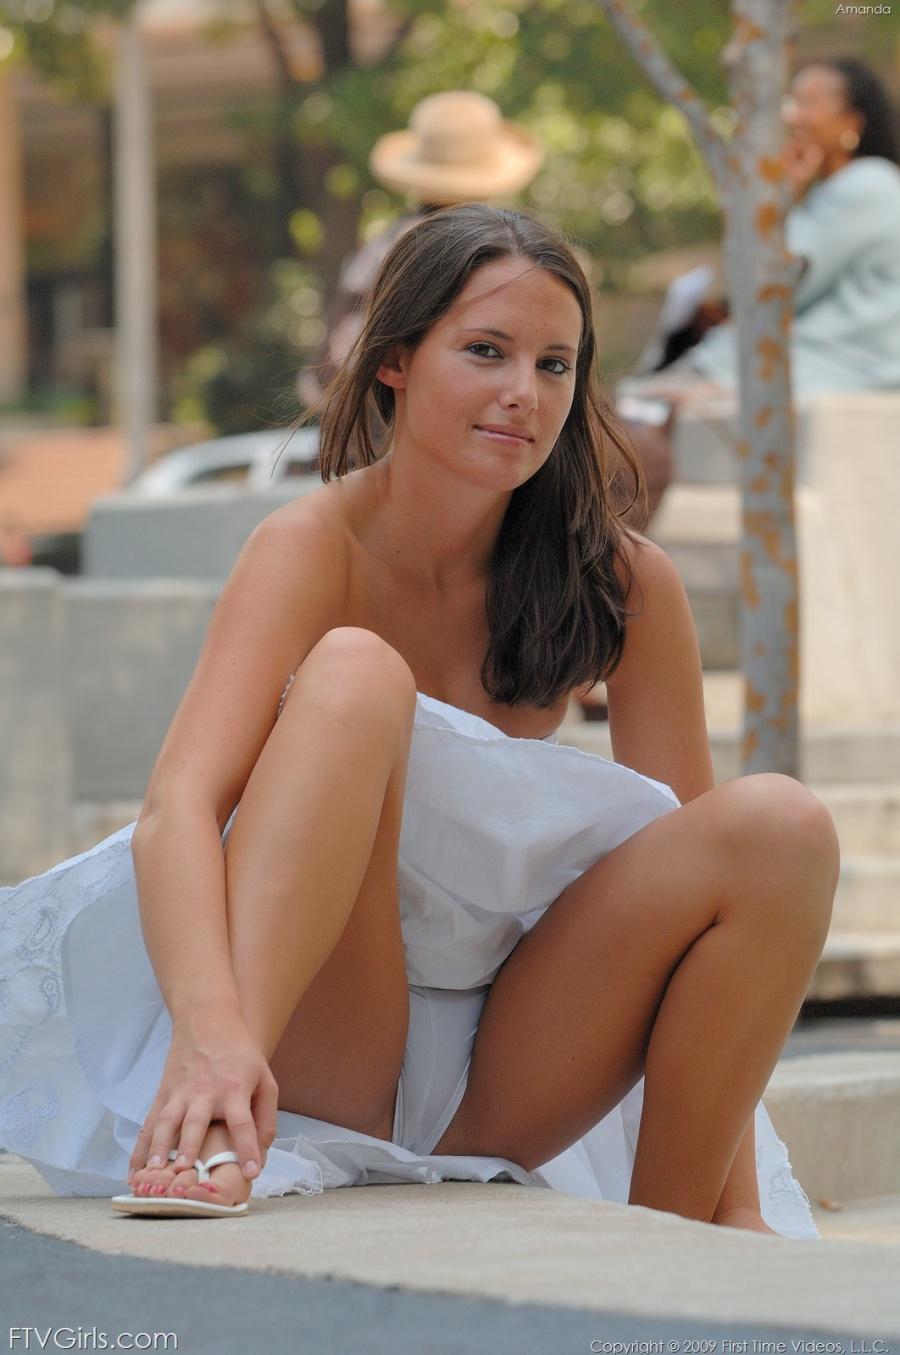 Public sexy hot girls